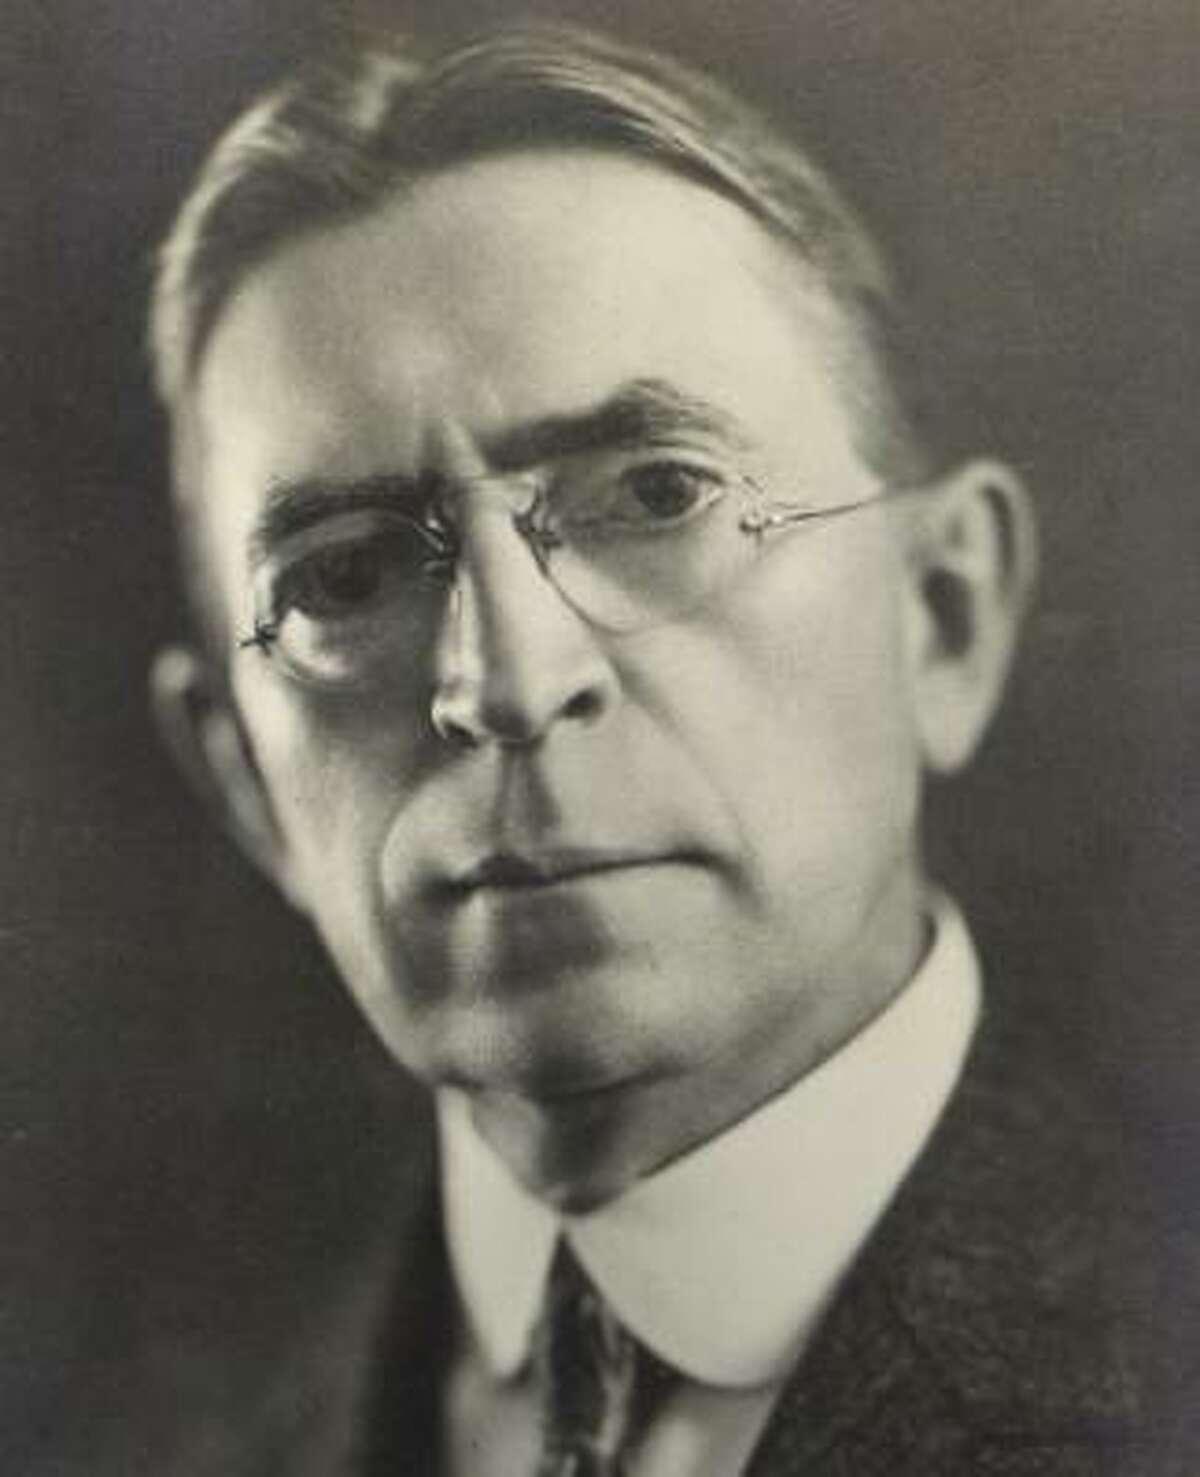 Former city editor George Kepple began the Goodfellows program in 1912.